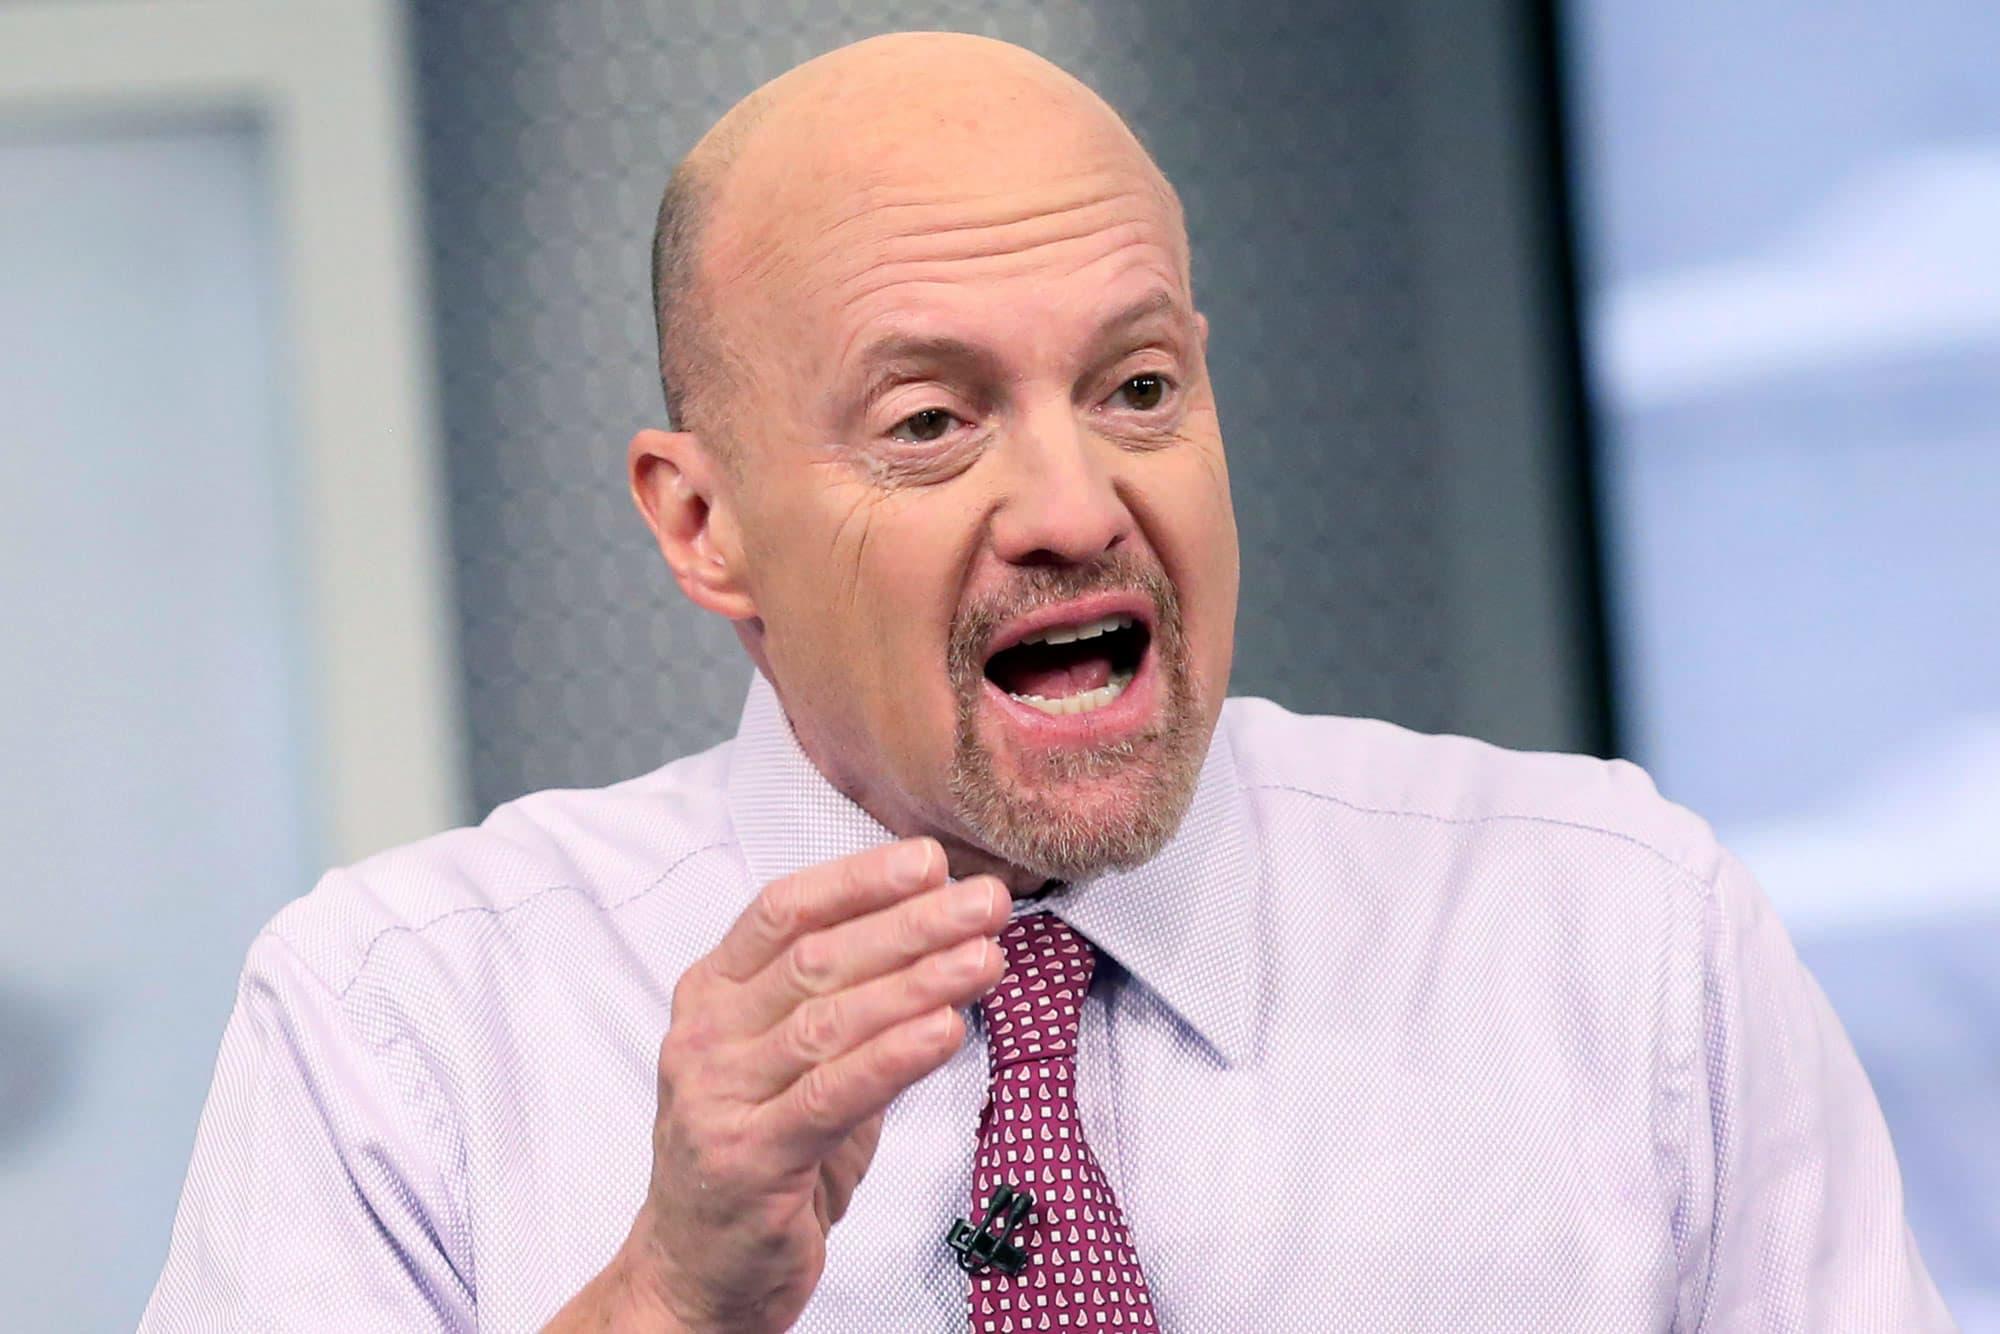 Jim Cramer reveals 7 stock market concerns going into earnings season